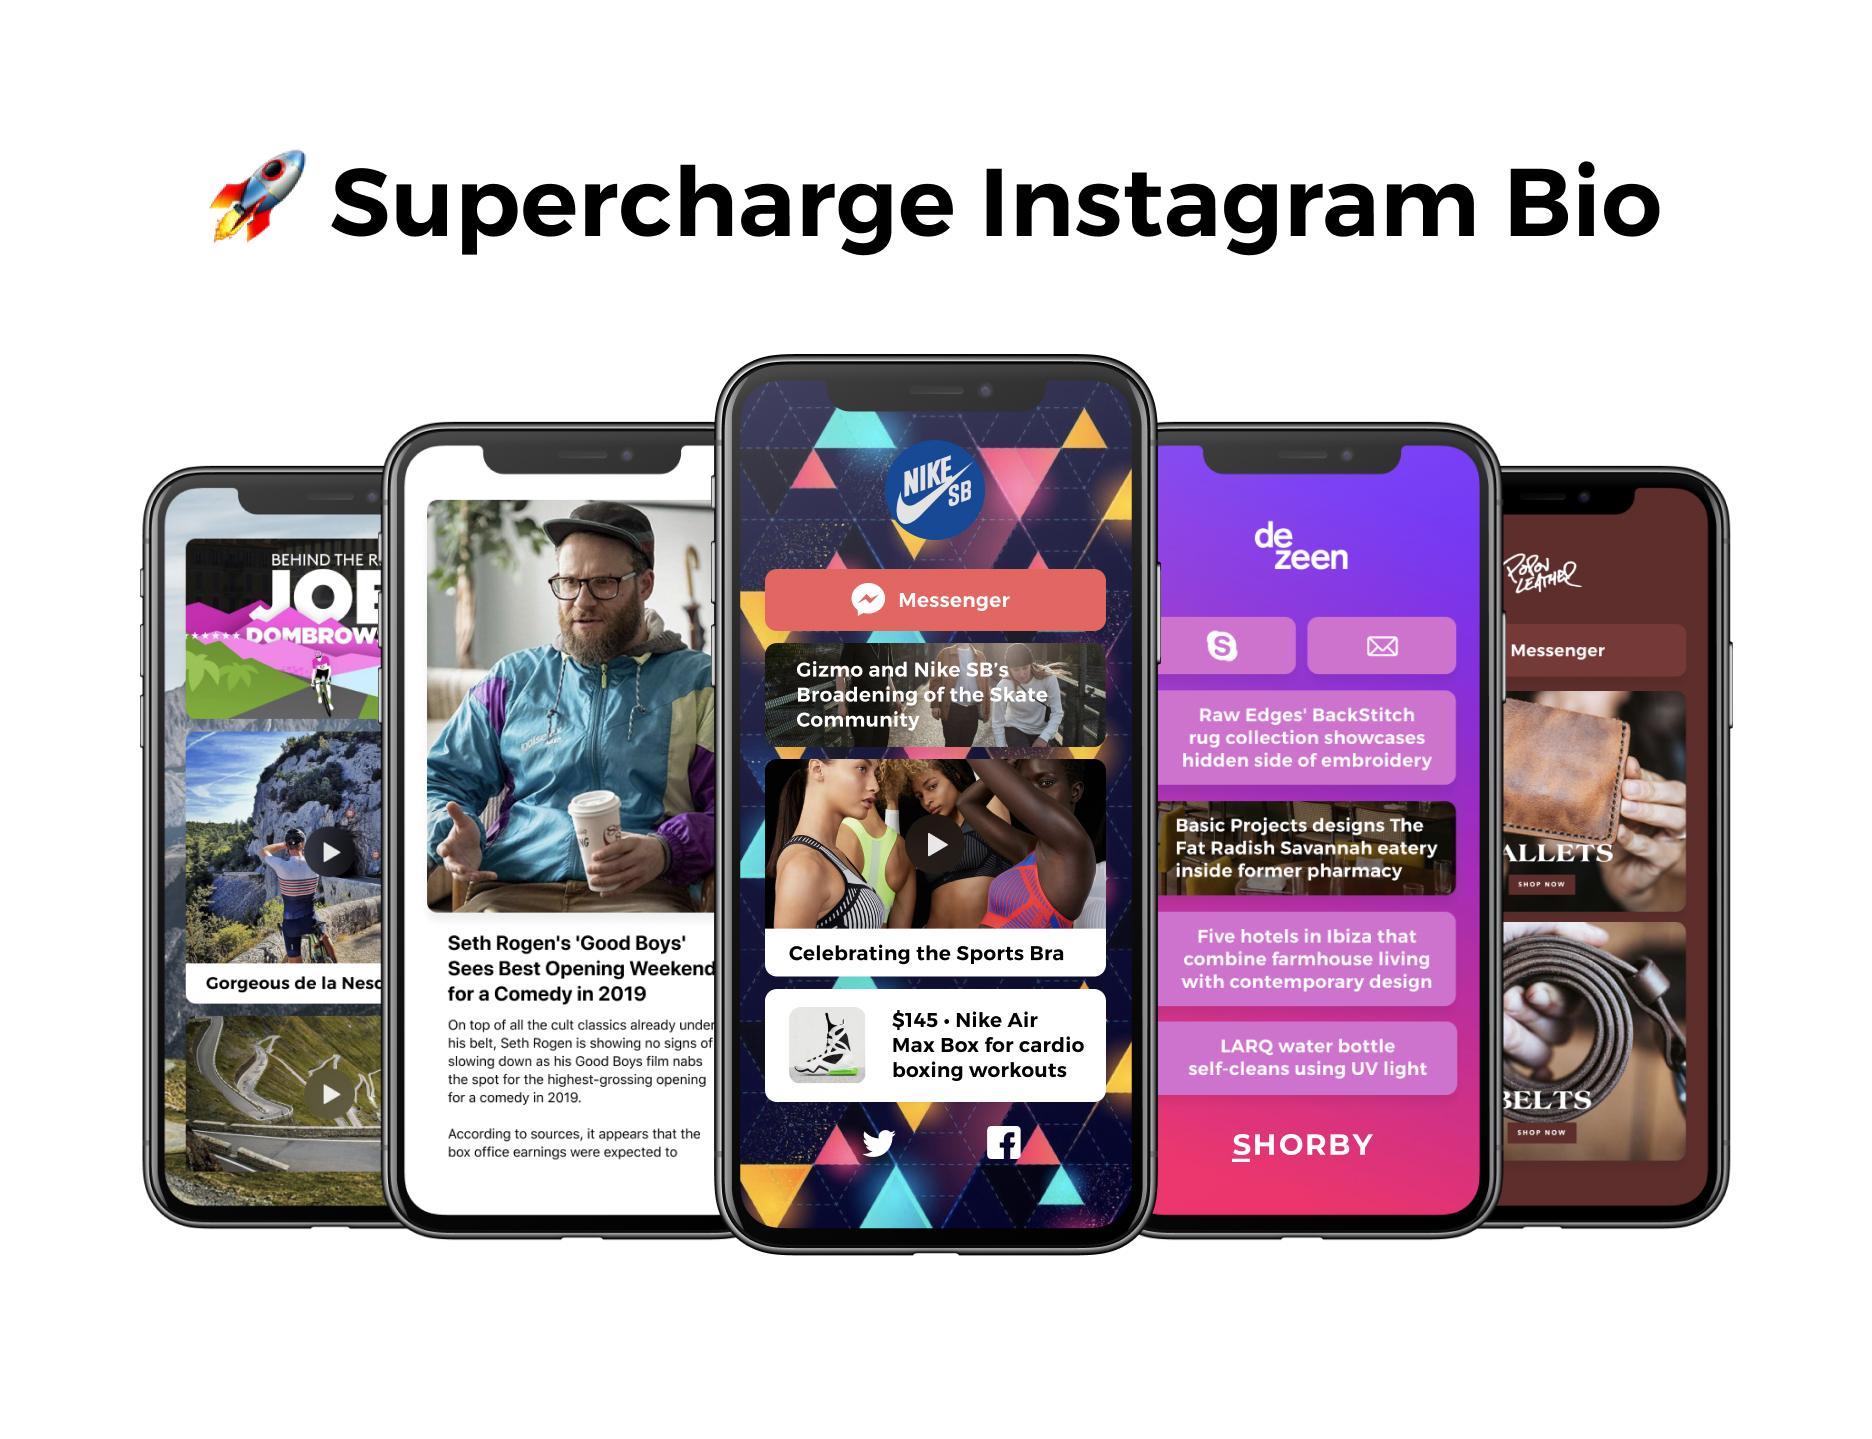 Turbocharge Your Instagram!